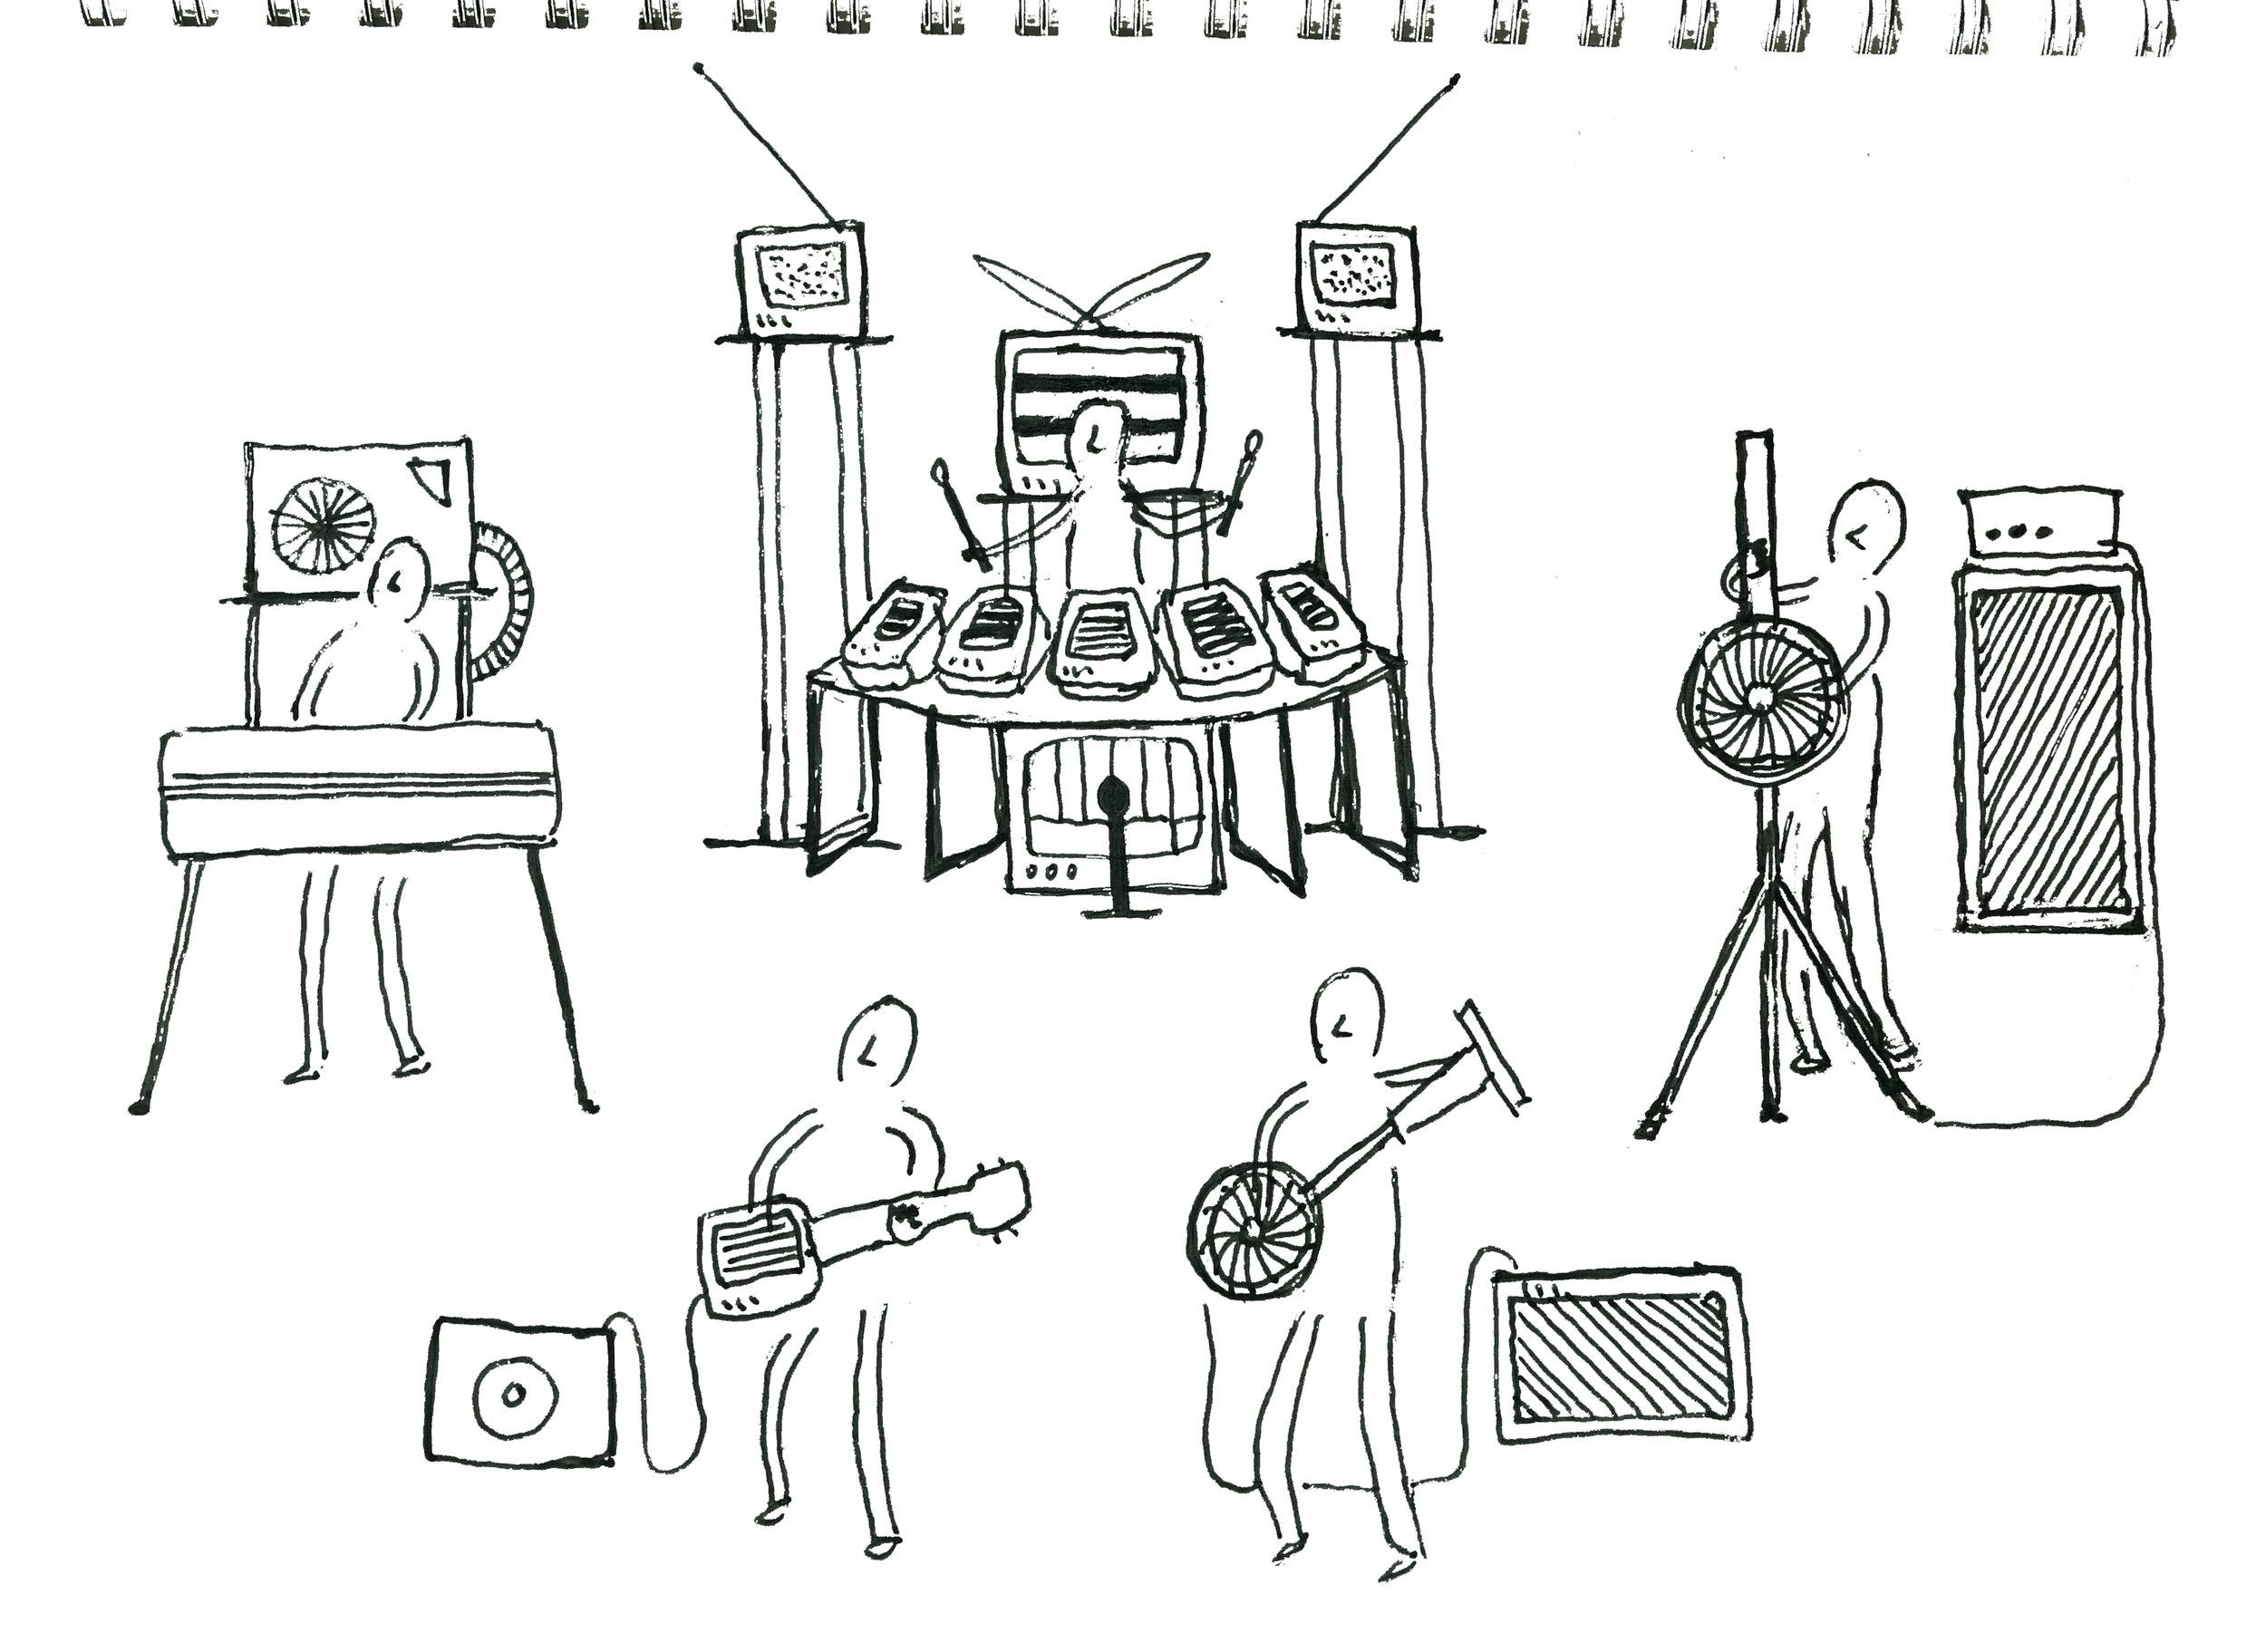 Sketch by Ei Wada